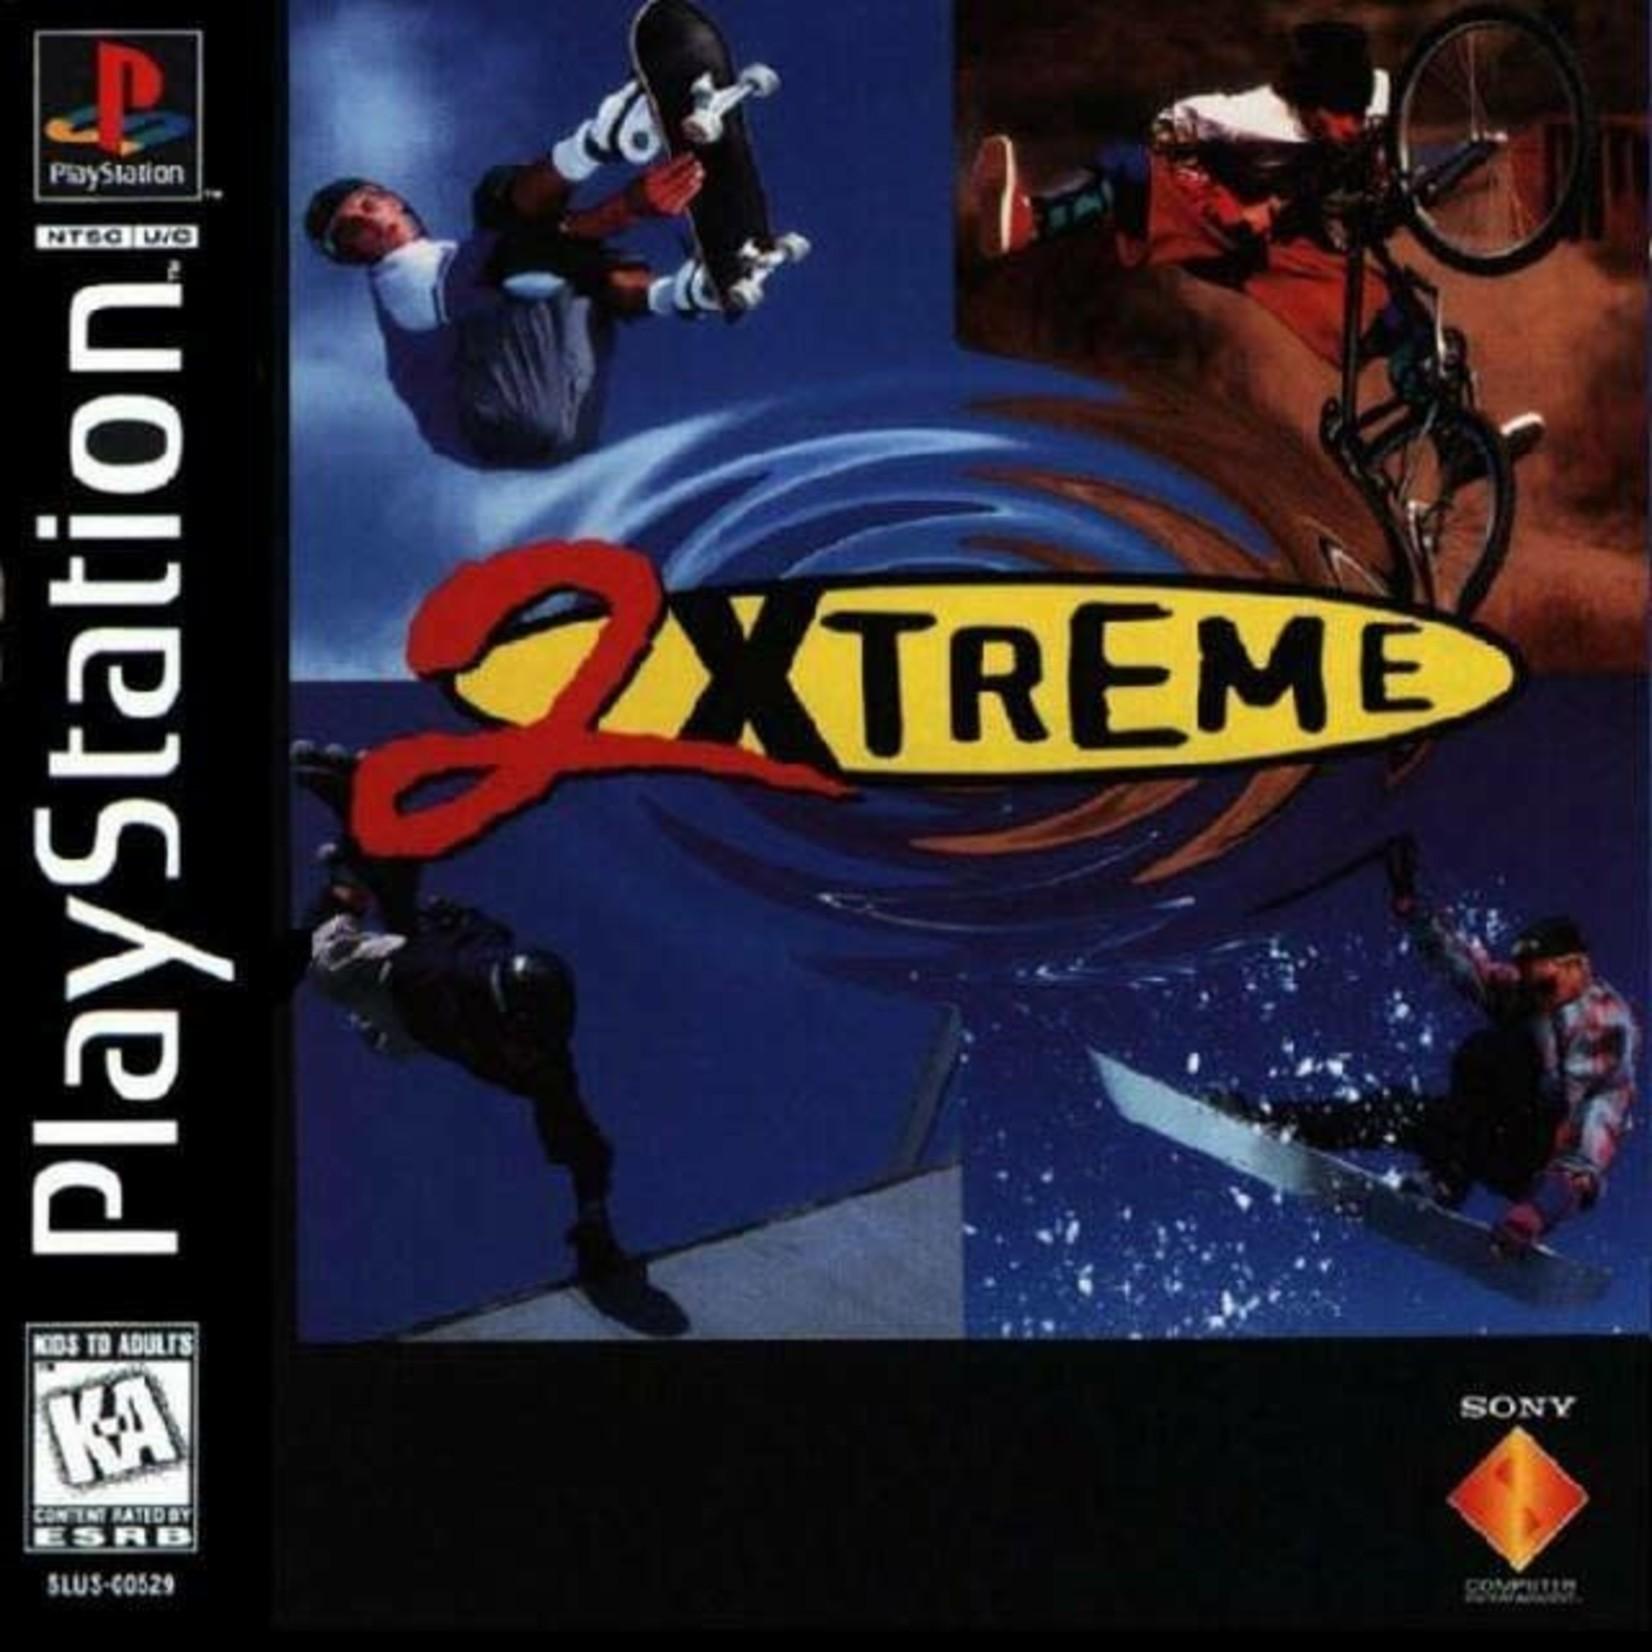 PS1U-2Xtreme